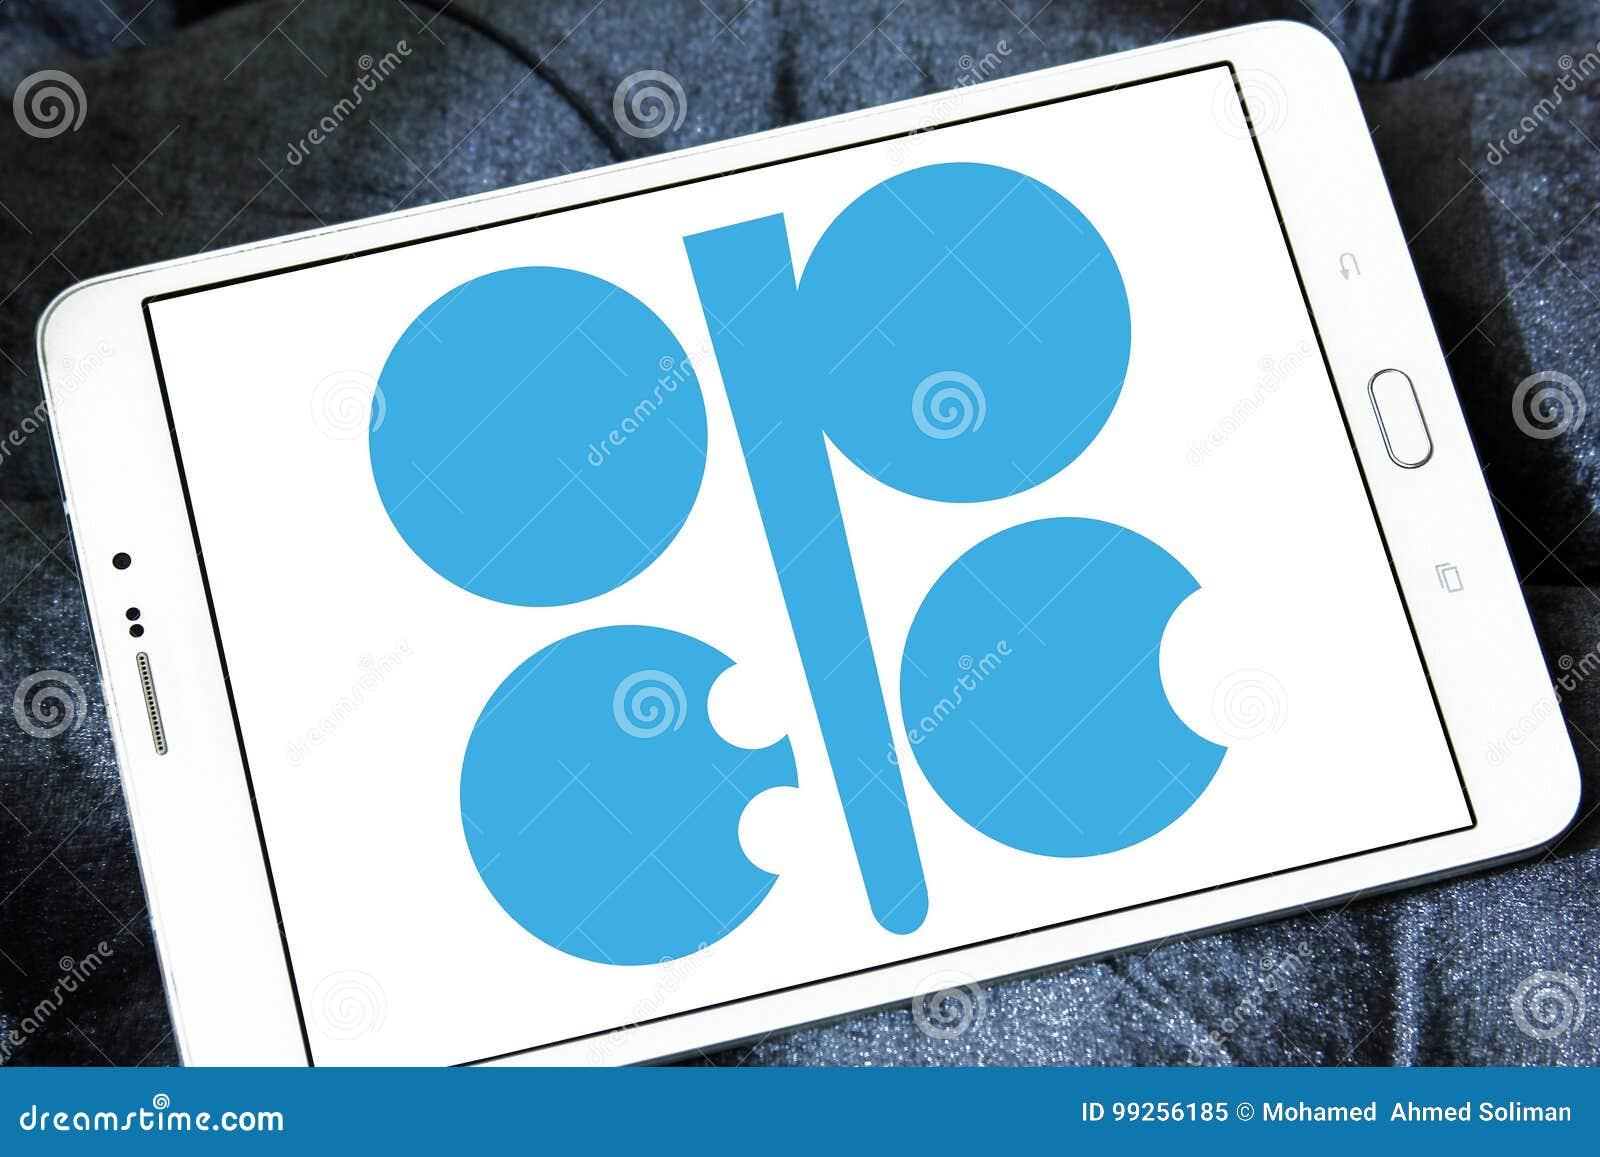 OPEC organization logo